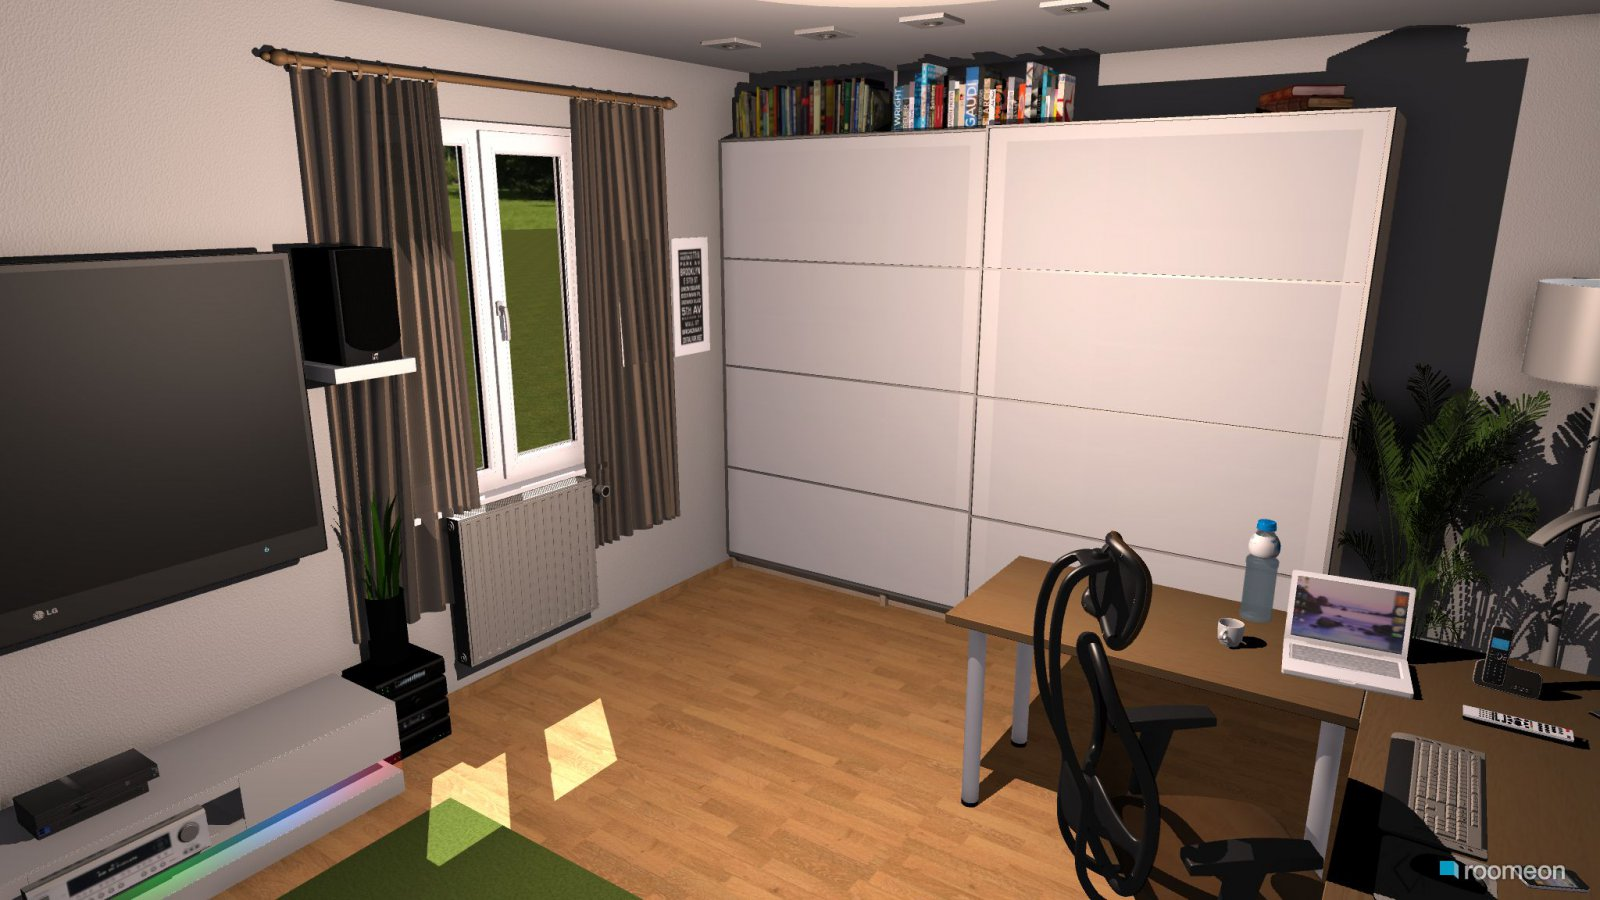 Room Design My Dream Room Roomeon Community